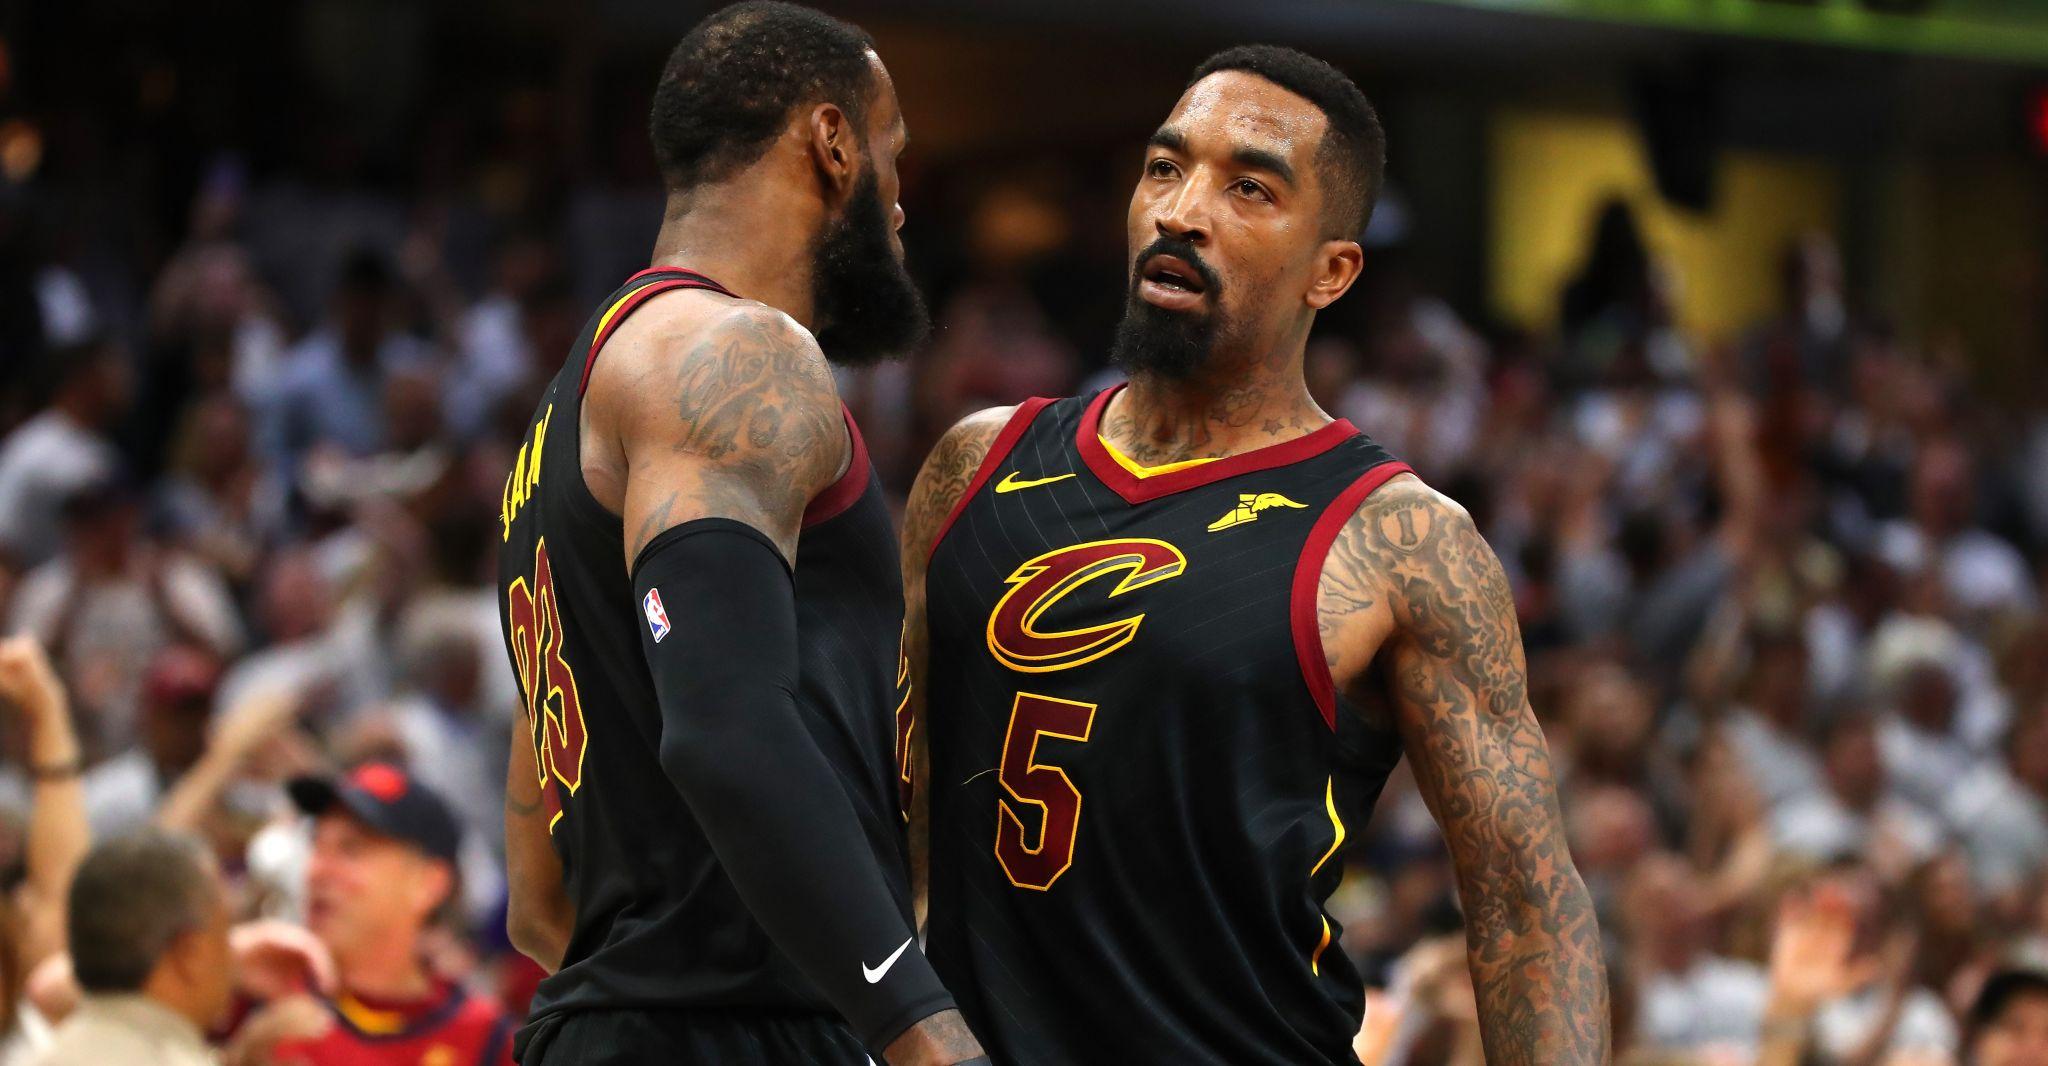 c608e7821864 Boston bound  LeBron James pushes Cavaliers to Game 7 vs. Celtics ...